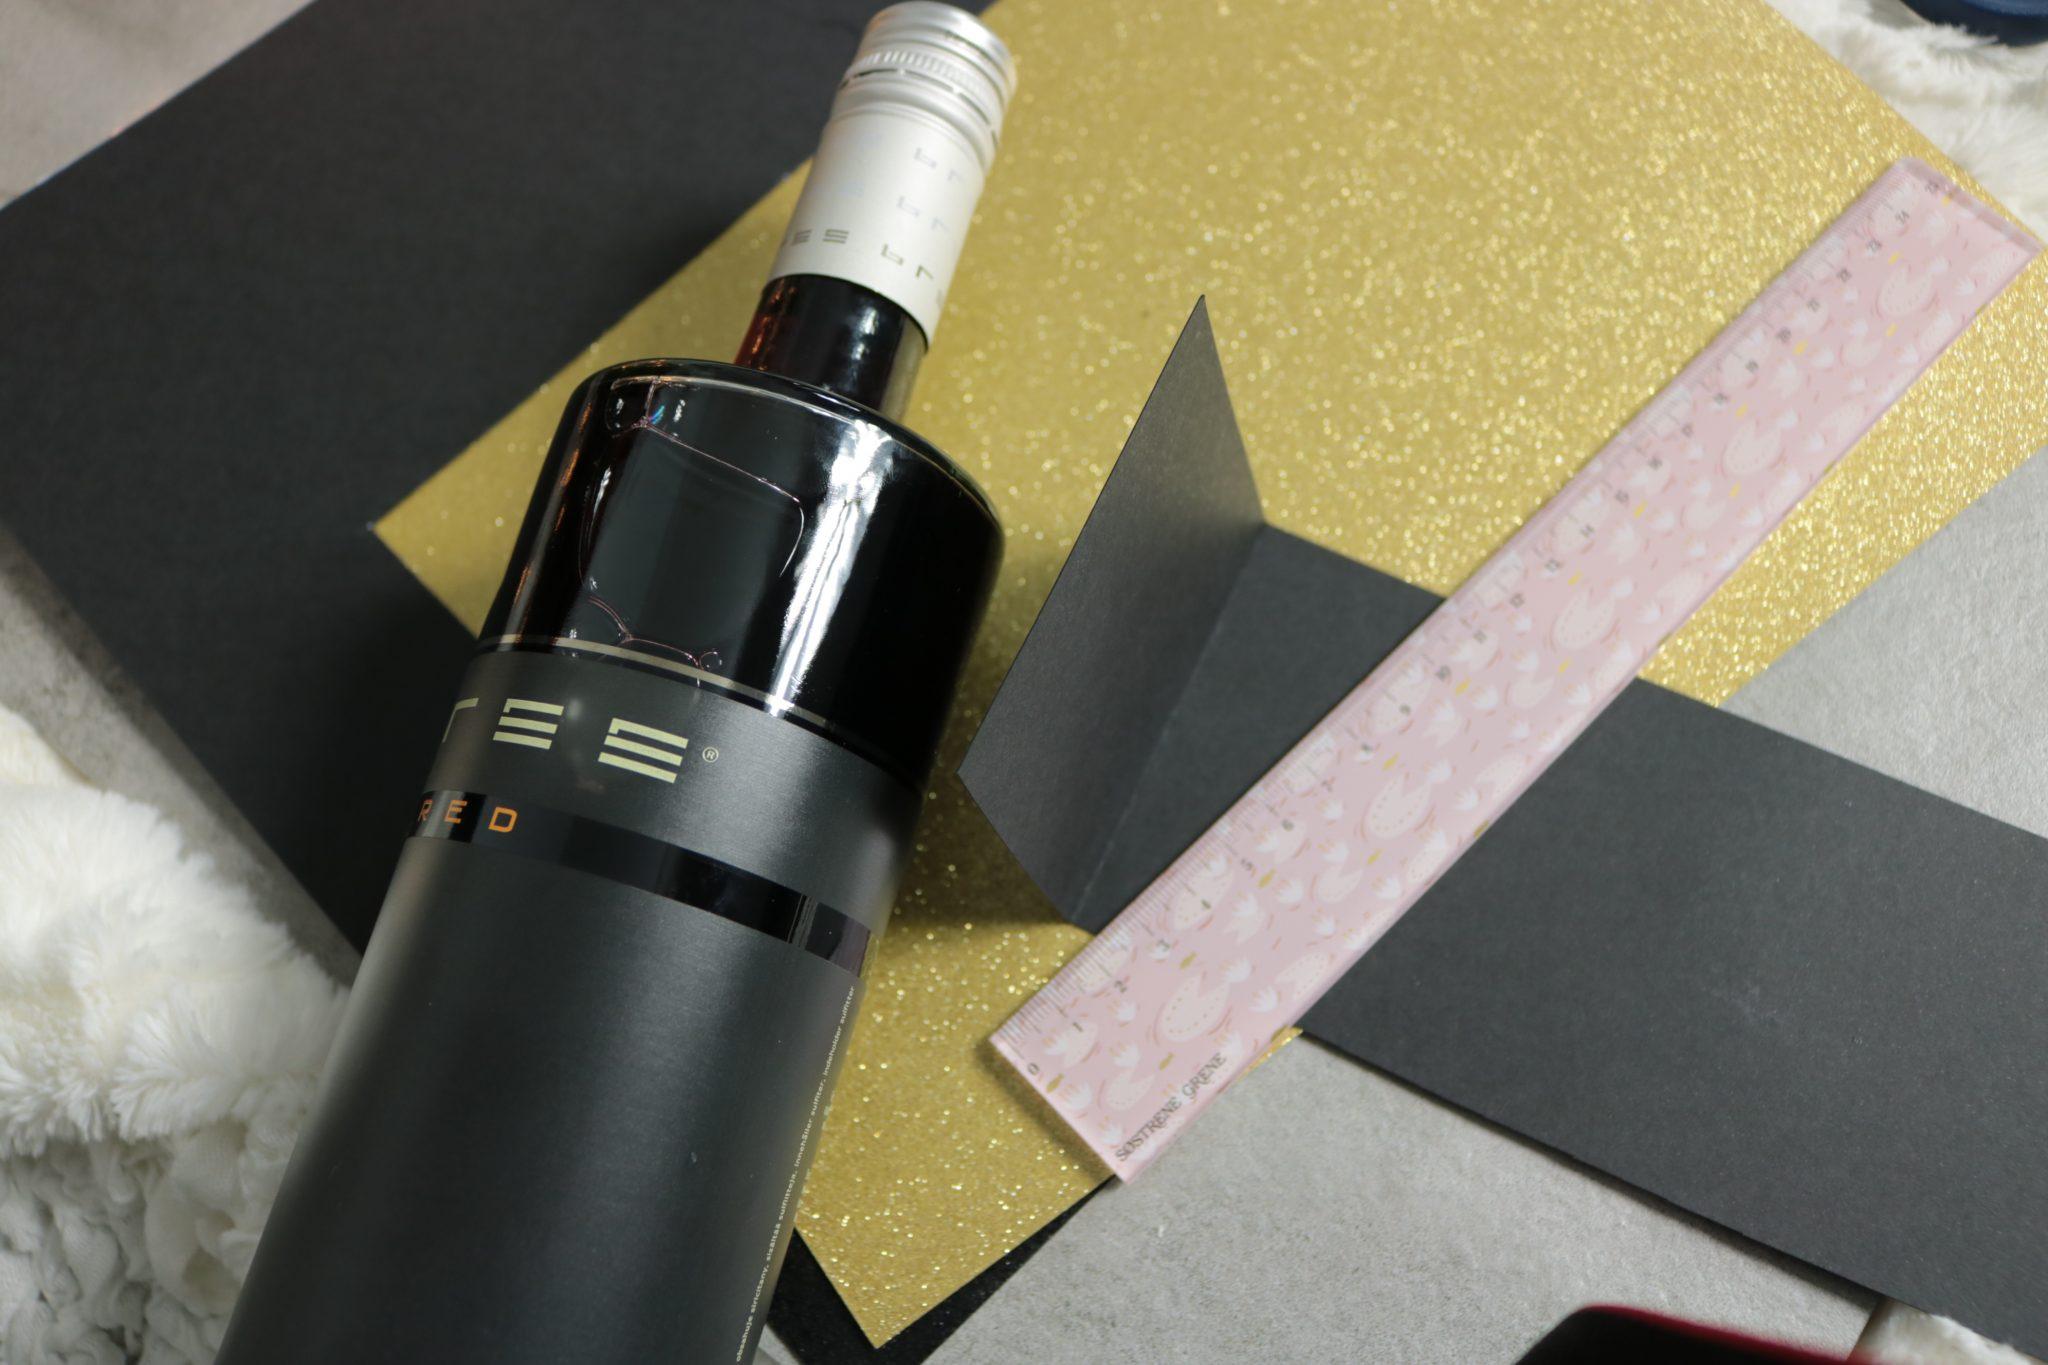 Bree-Wein-Merlot-Silvester-DIY-06